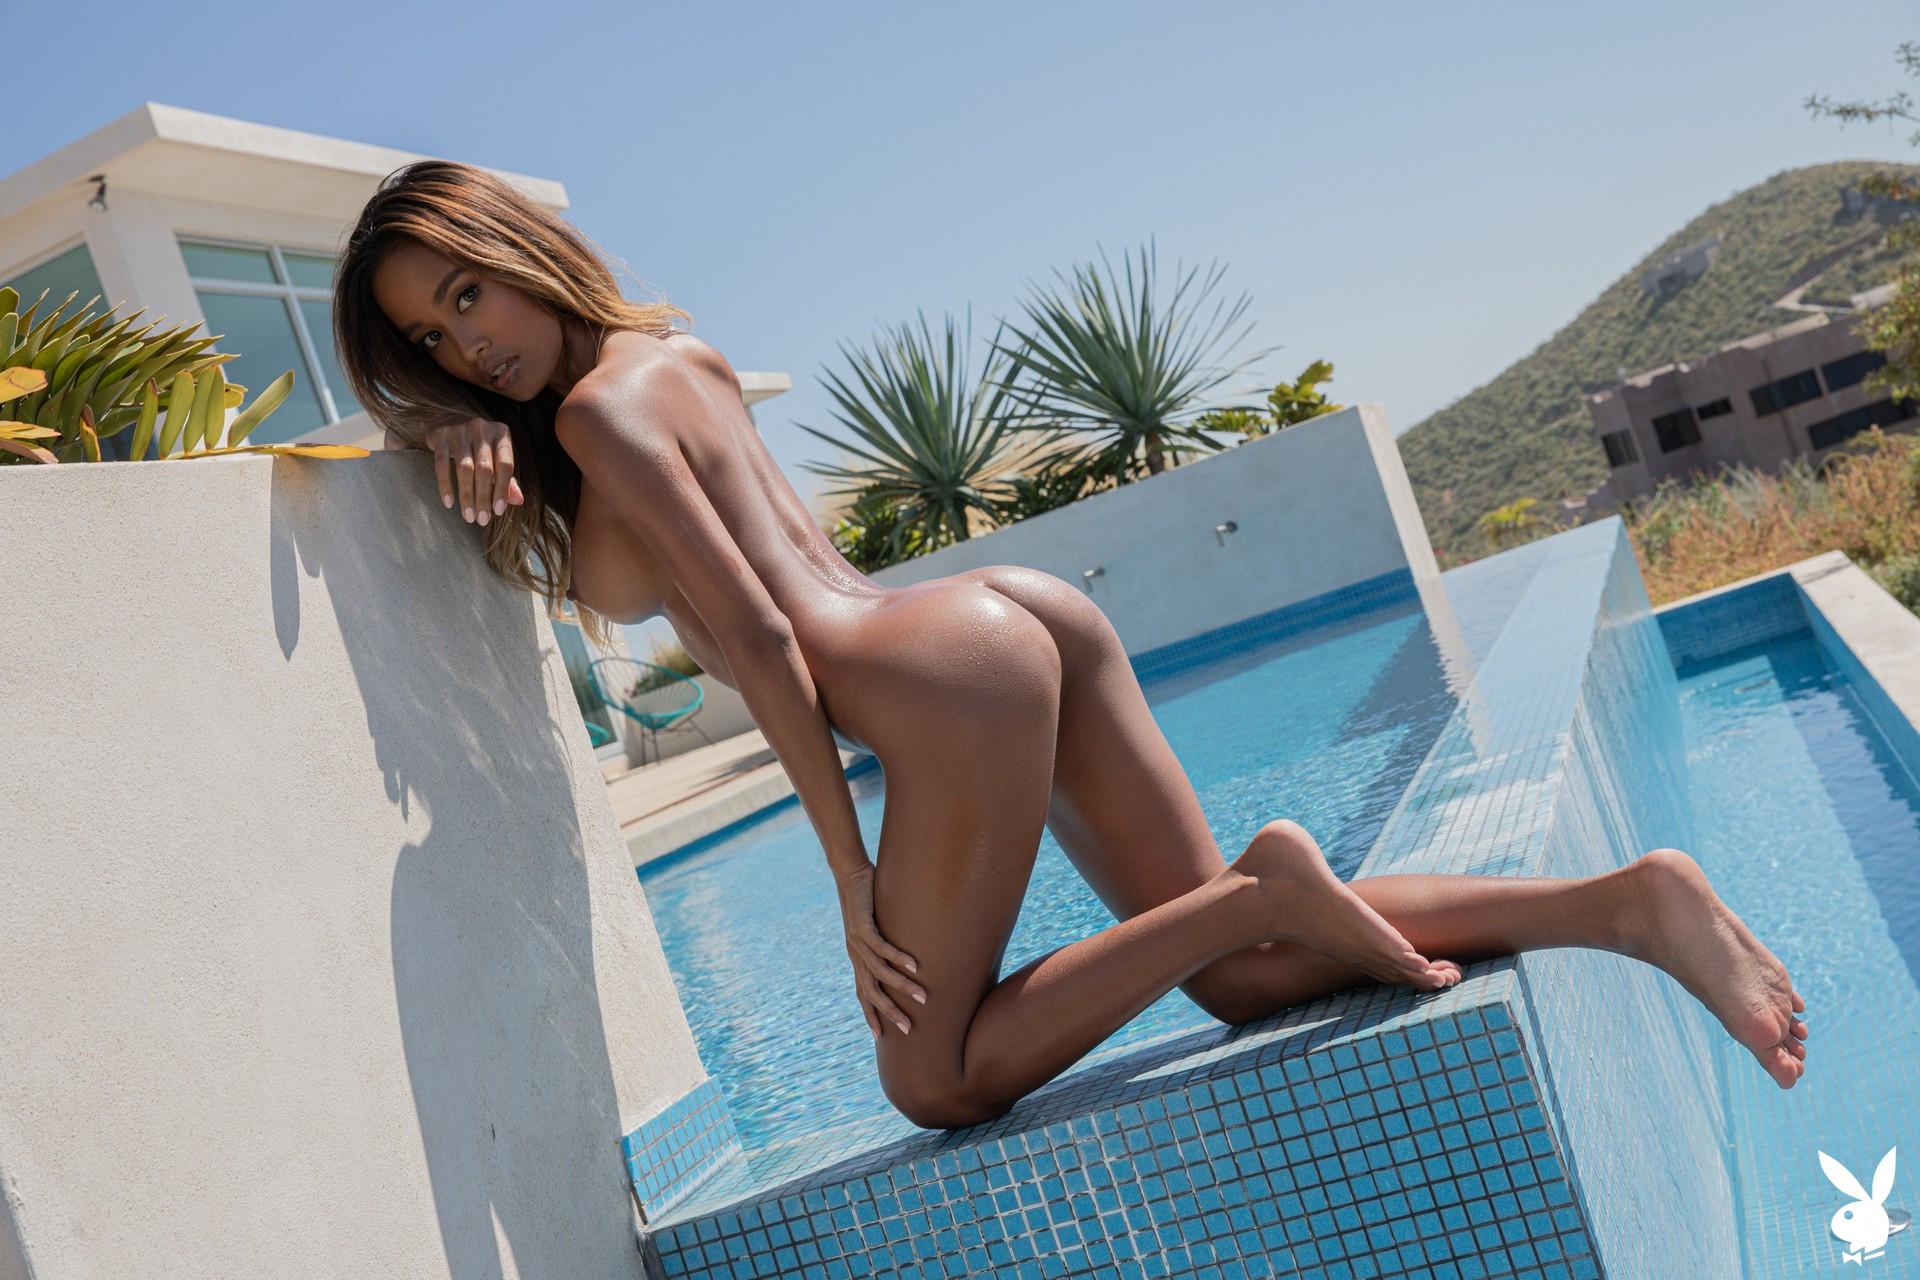 Putri Cinta In Feel The Heat Playboy Plus (18)